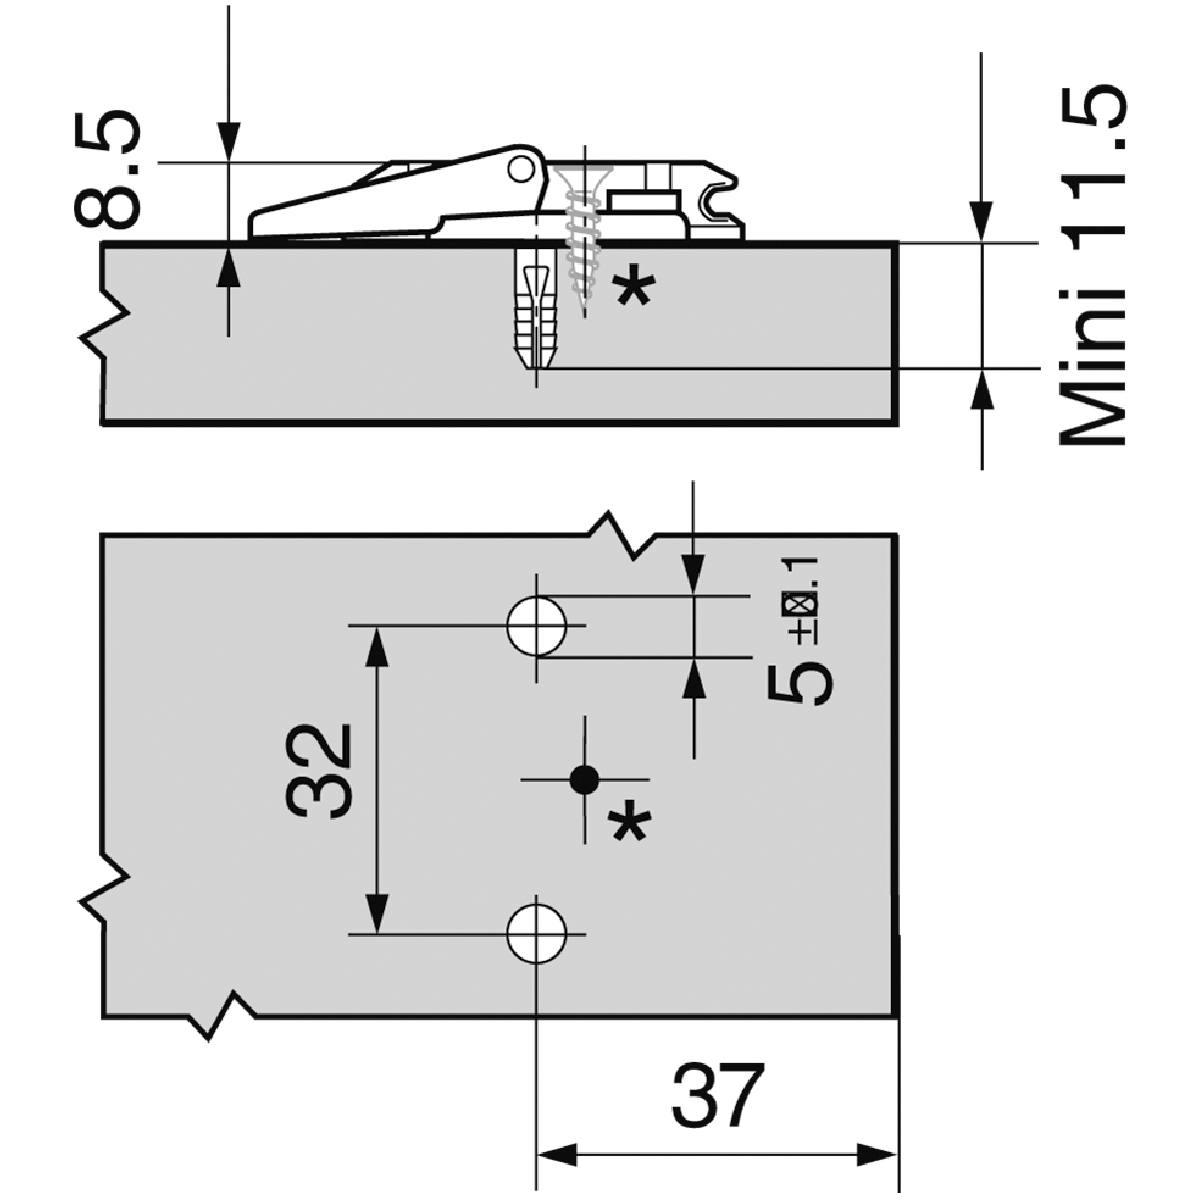 EMBASE CROIX HT : 8,5 MM INSERTA